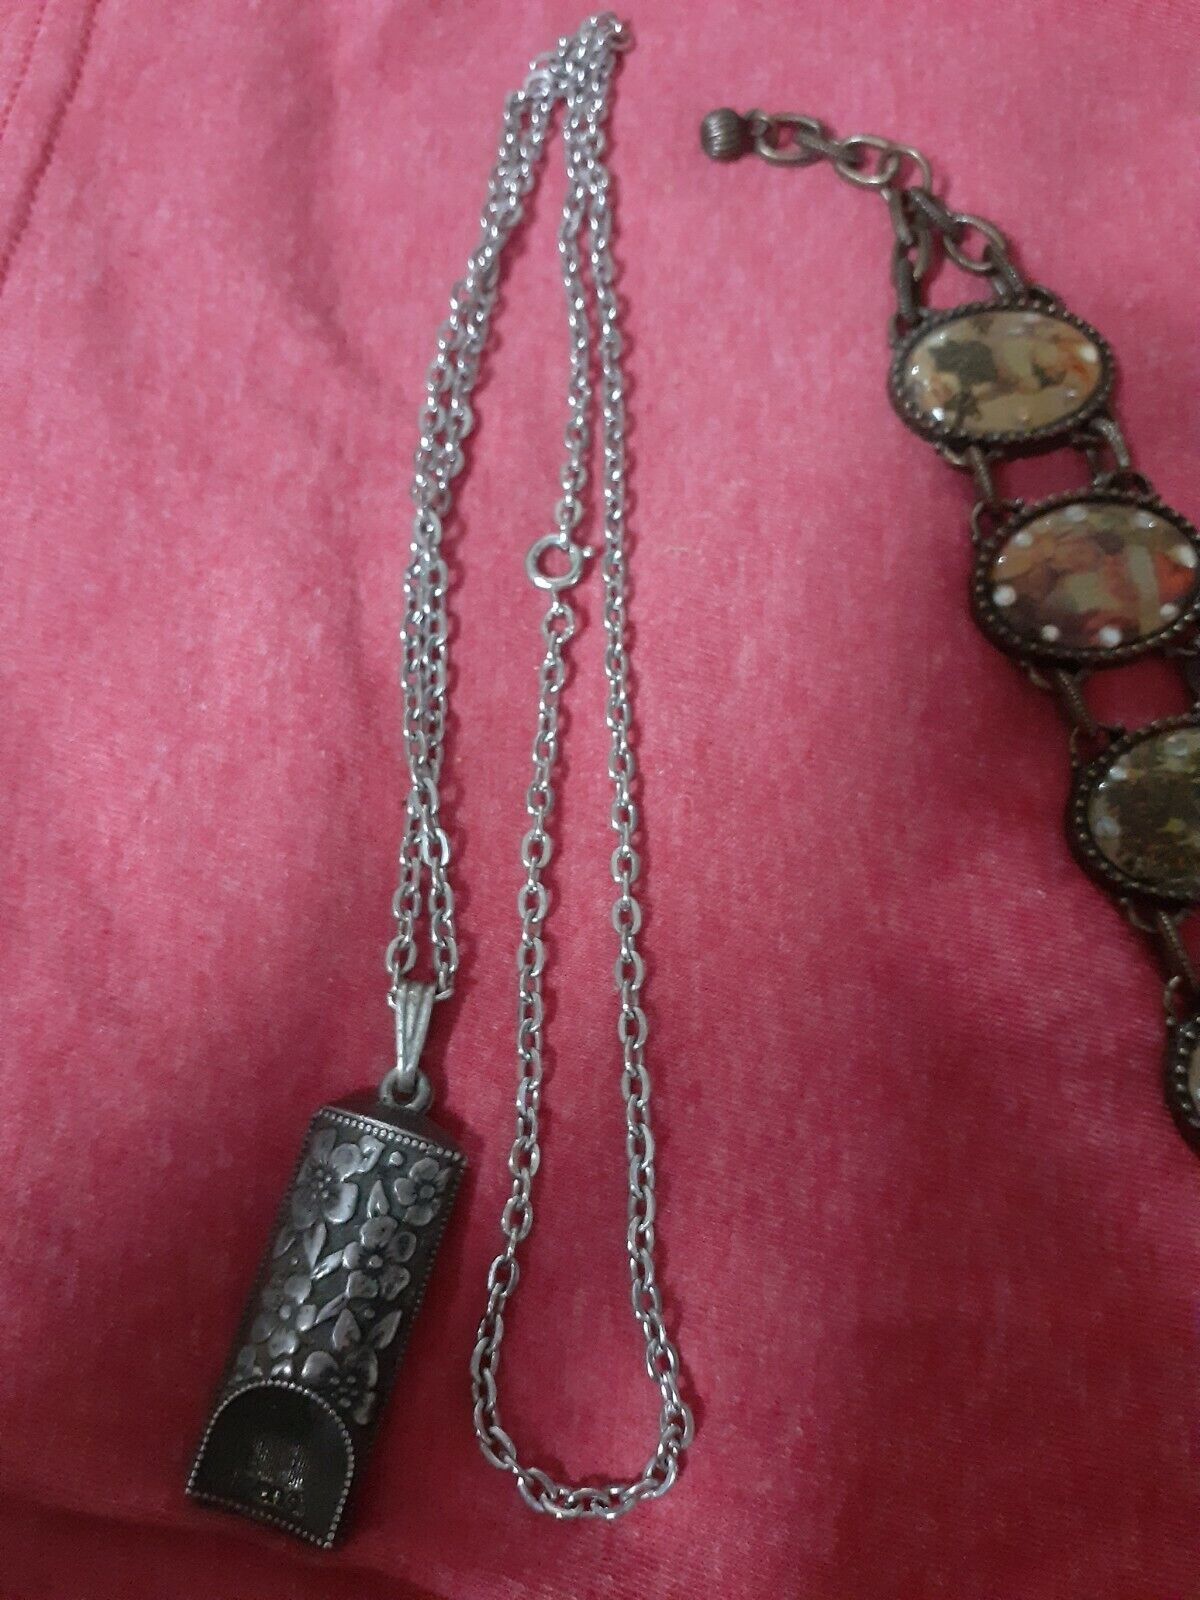 Cameo Pendant Elegant Necklace Victorian Necklace Victorian Cameo D4 Victorian Style Necklace 26 Inch Avon Necklace Cameo Necklace